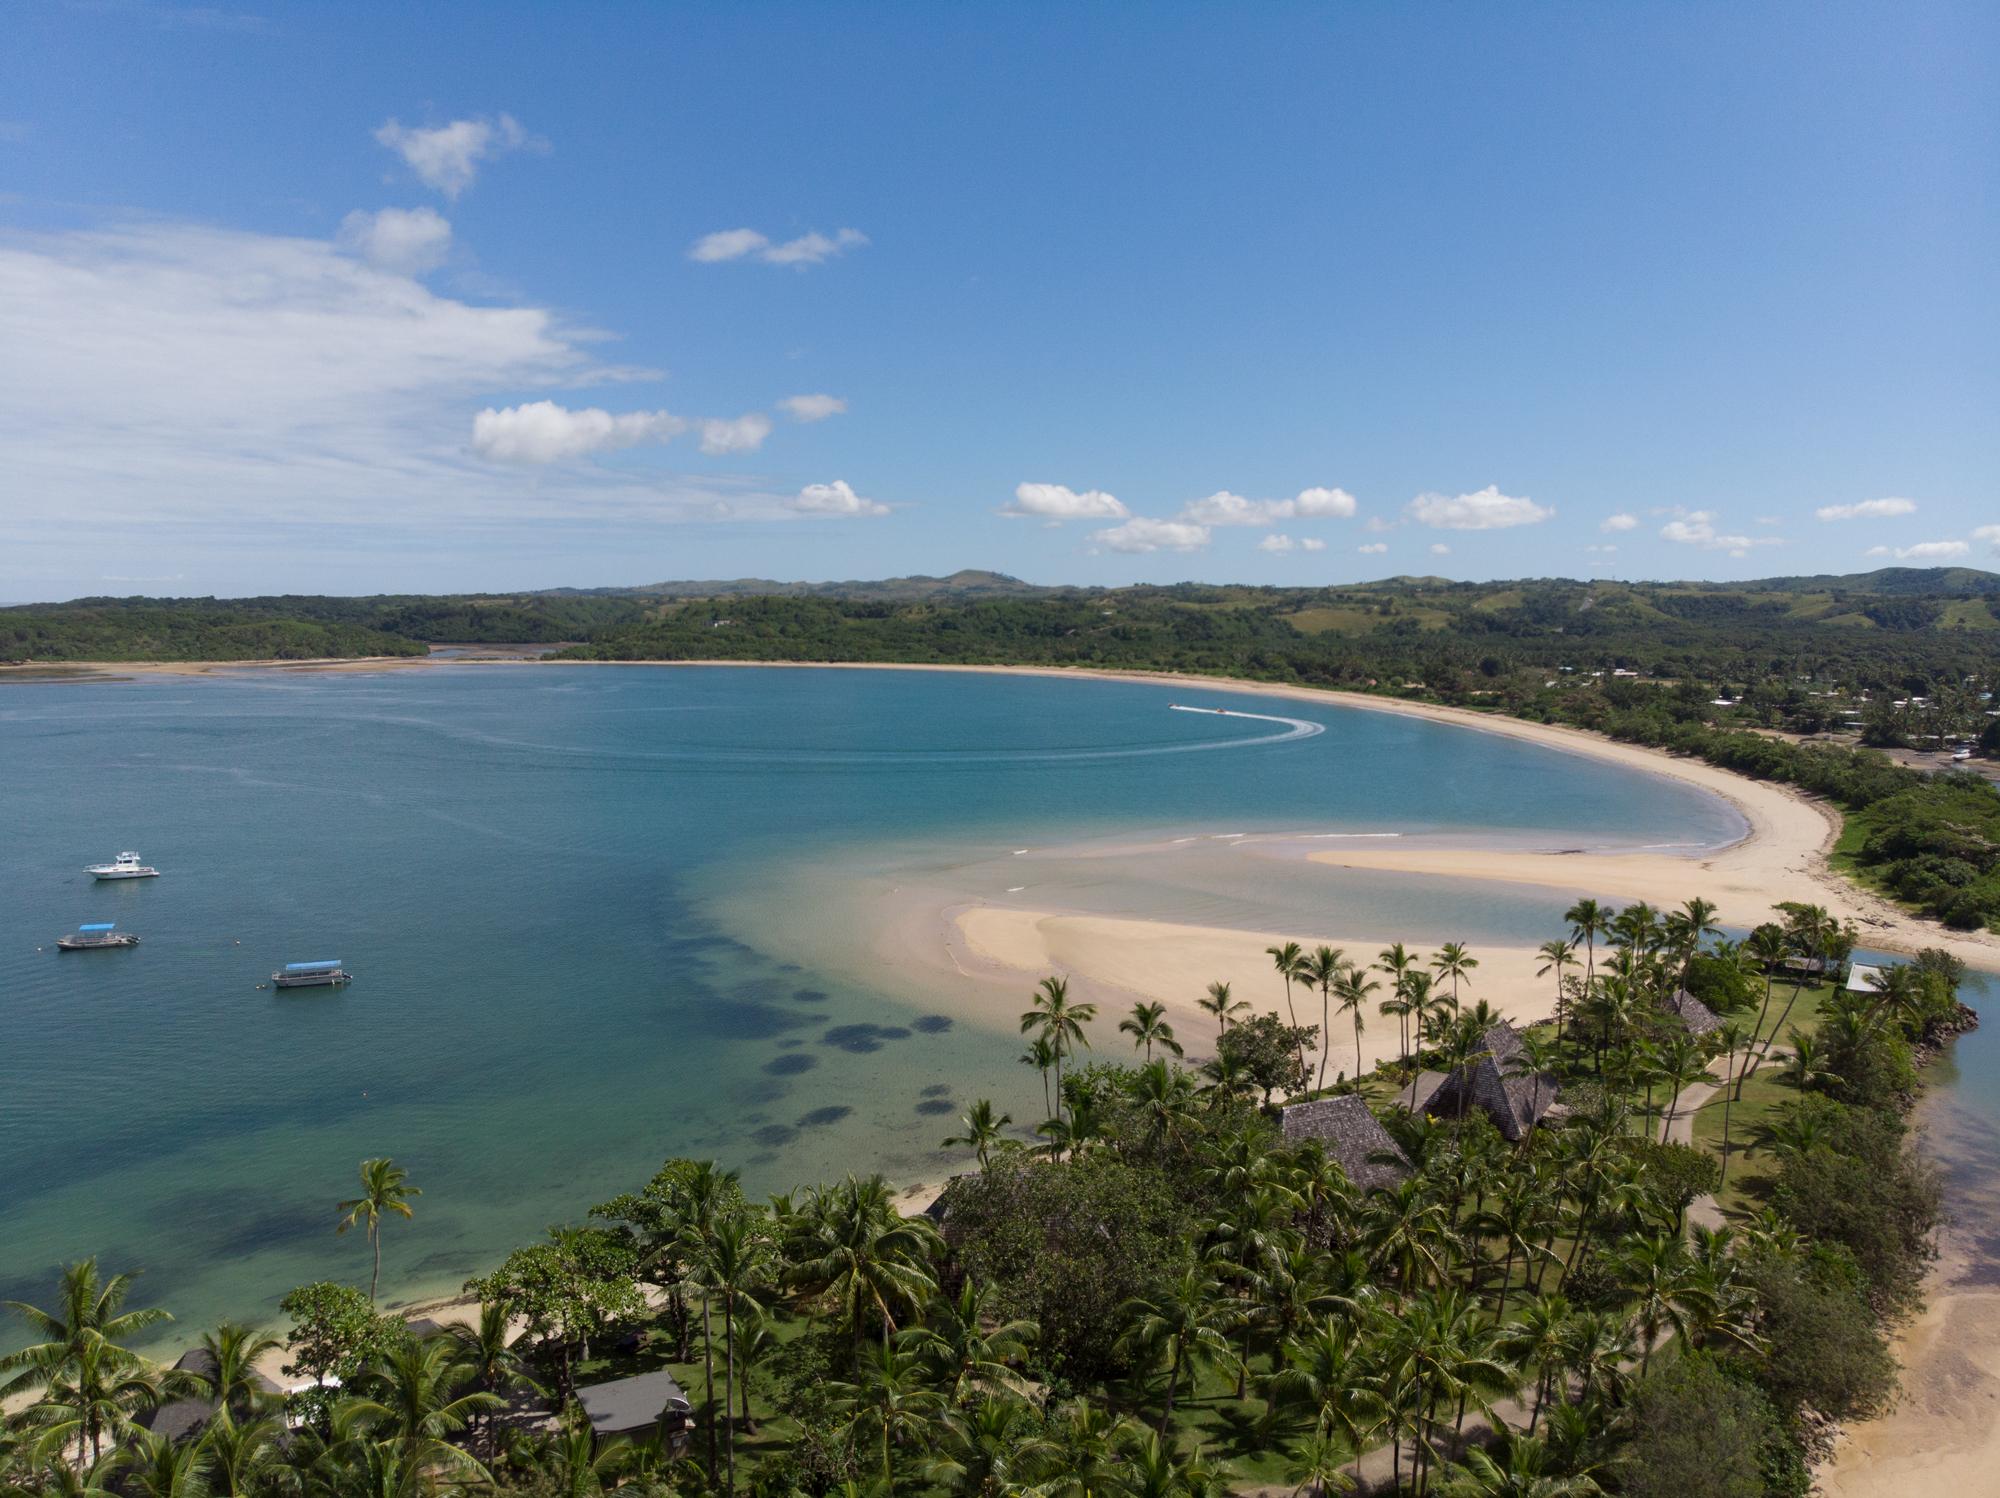 Away-Lands-Presets_Beach-Drone-1-Before.jpg